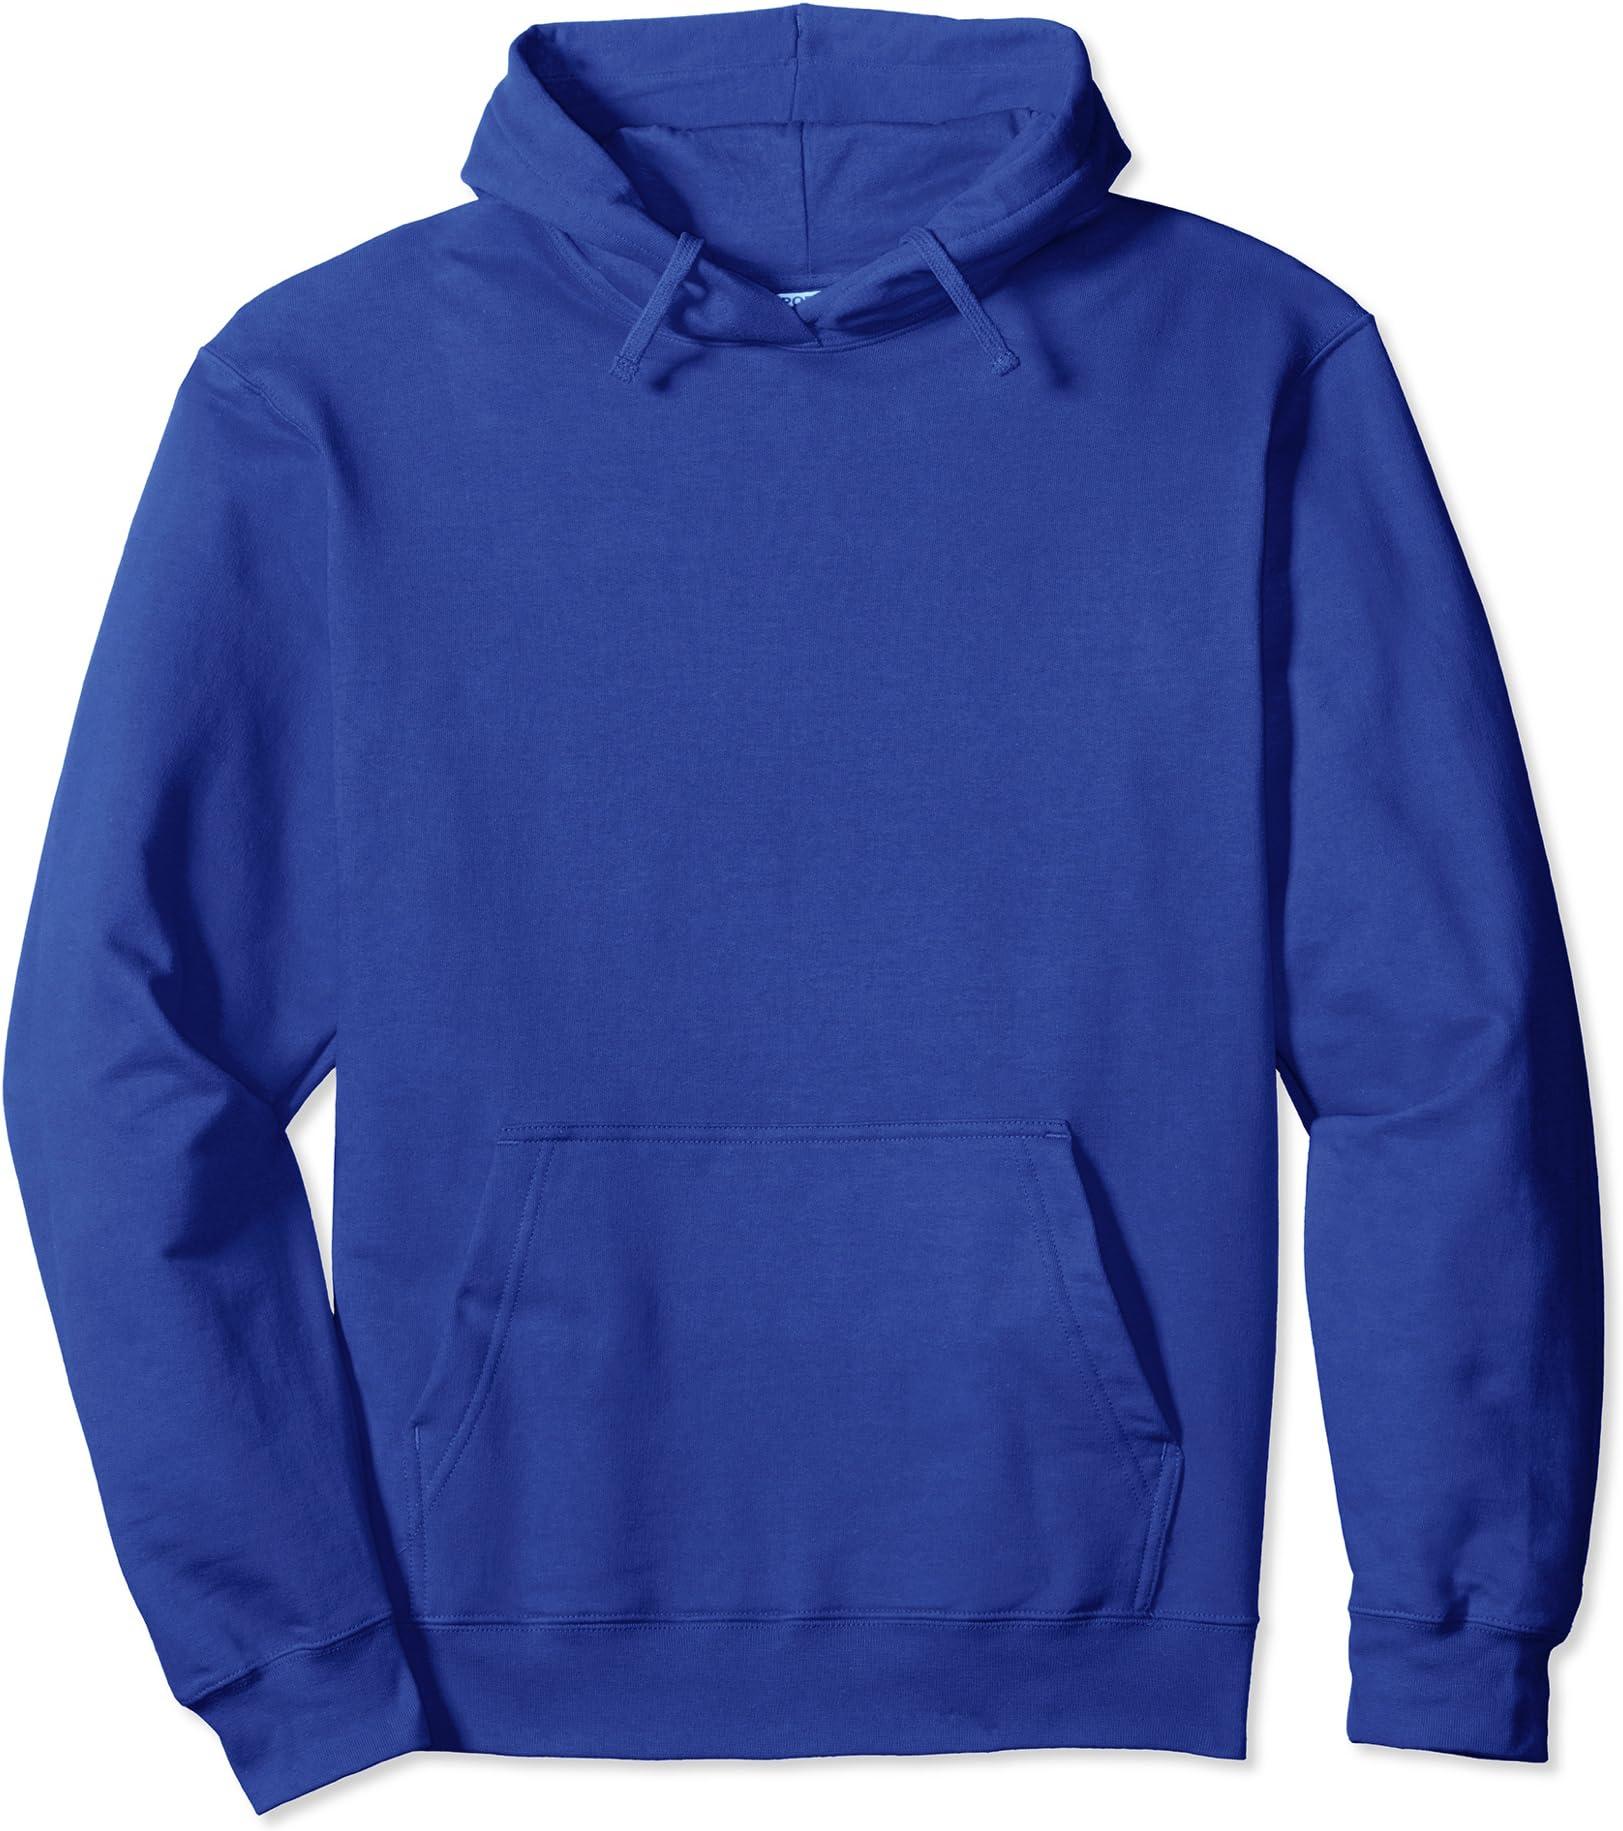 Nurses Call The Shots Women/'s Sweatshirt Plus Size Unisex Cotton Handmade Nurse